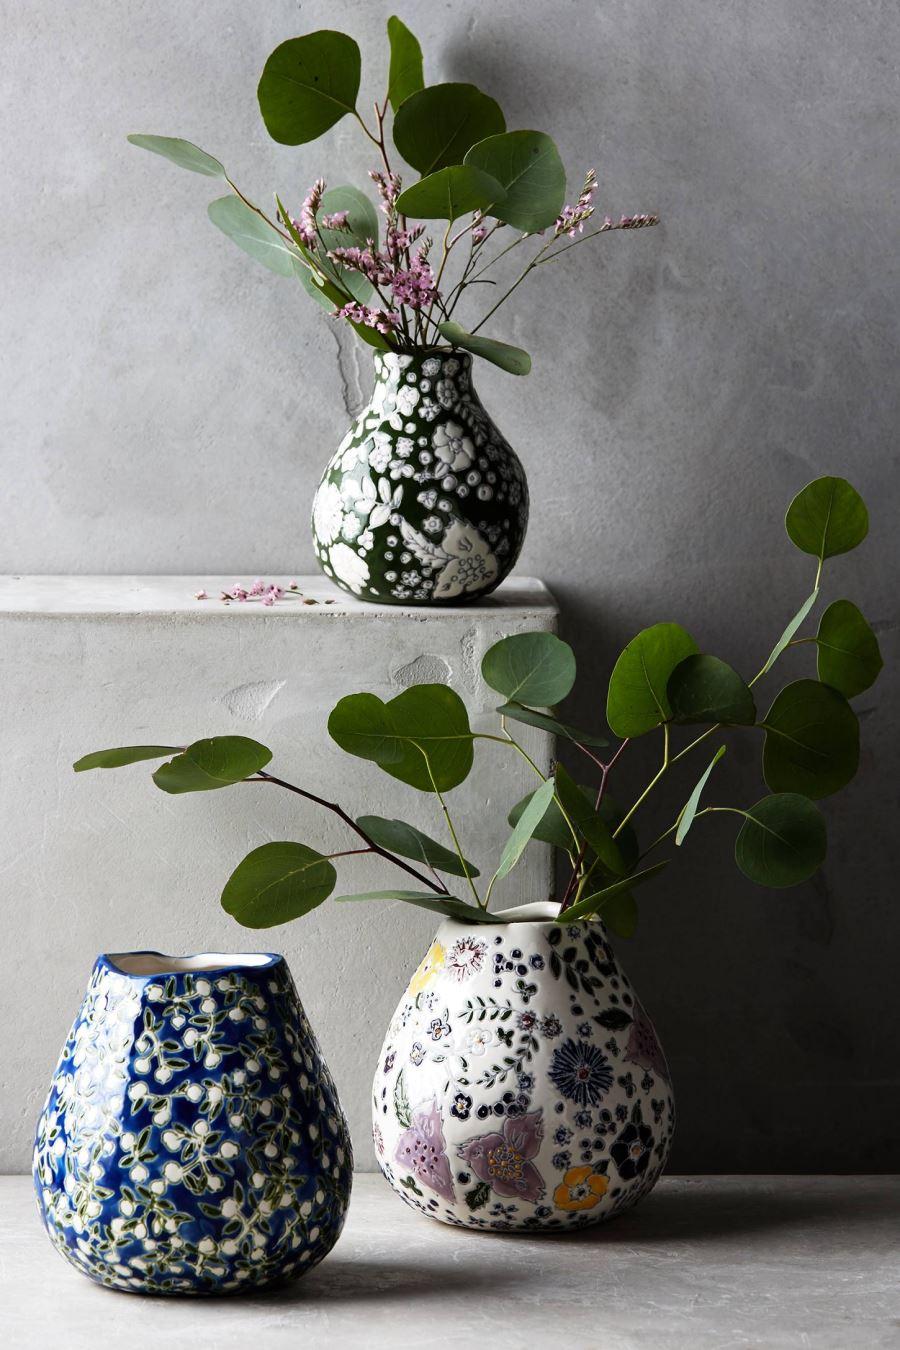 Ceramic vases from Anthropologie